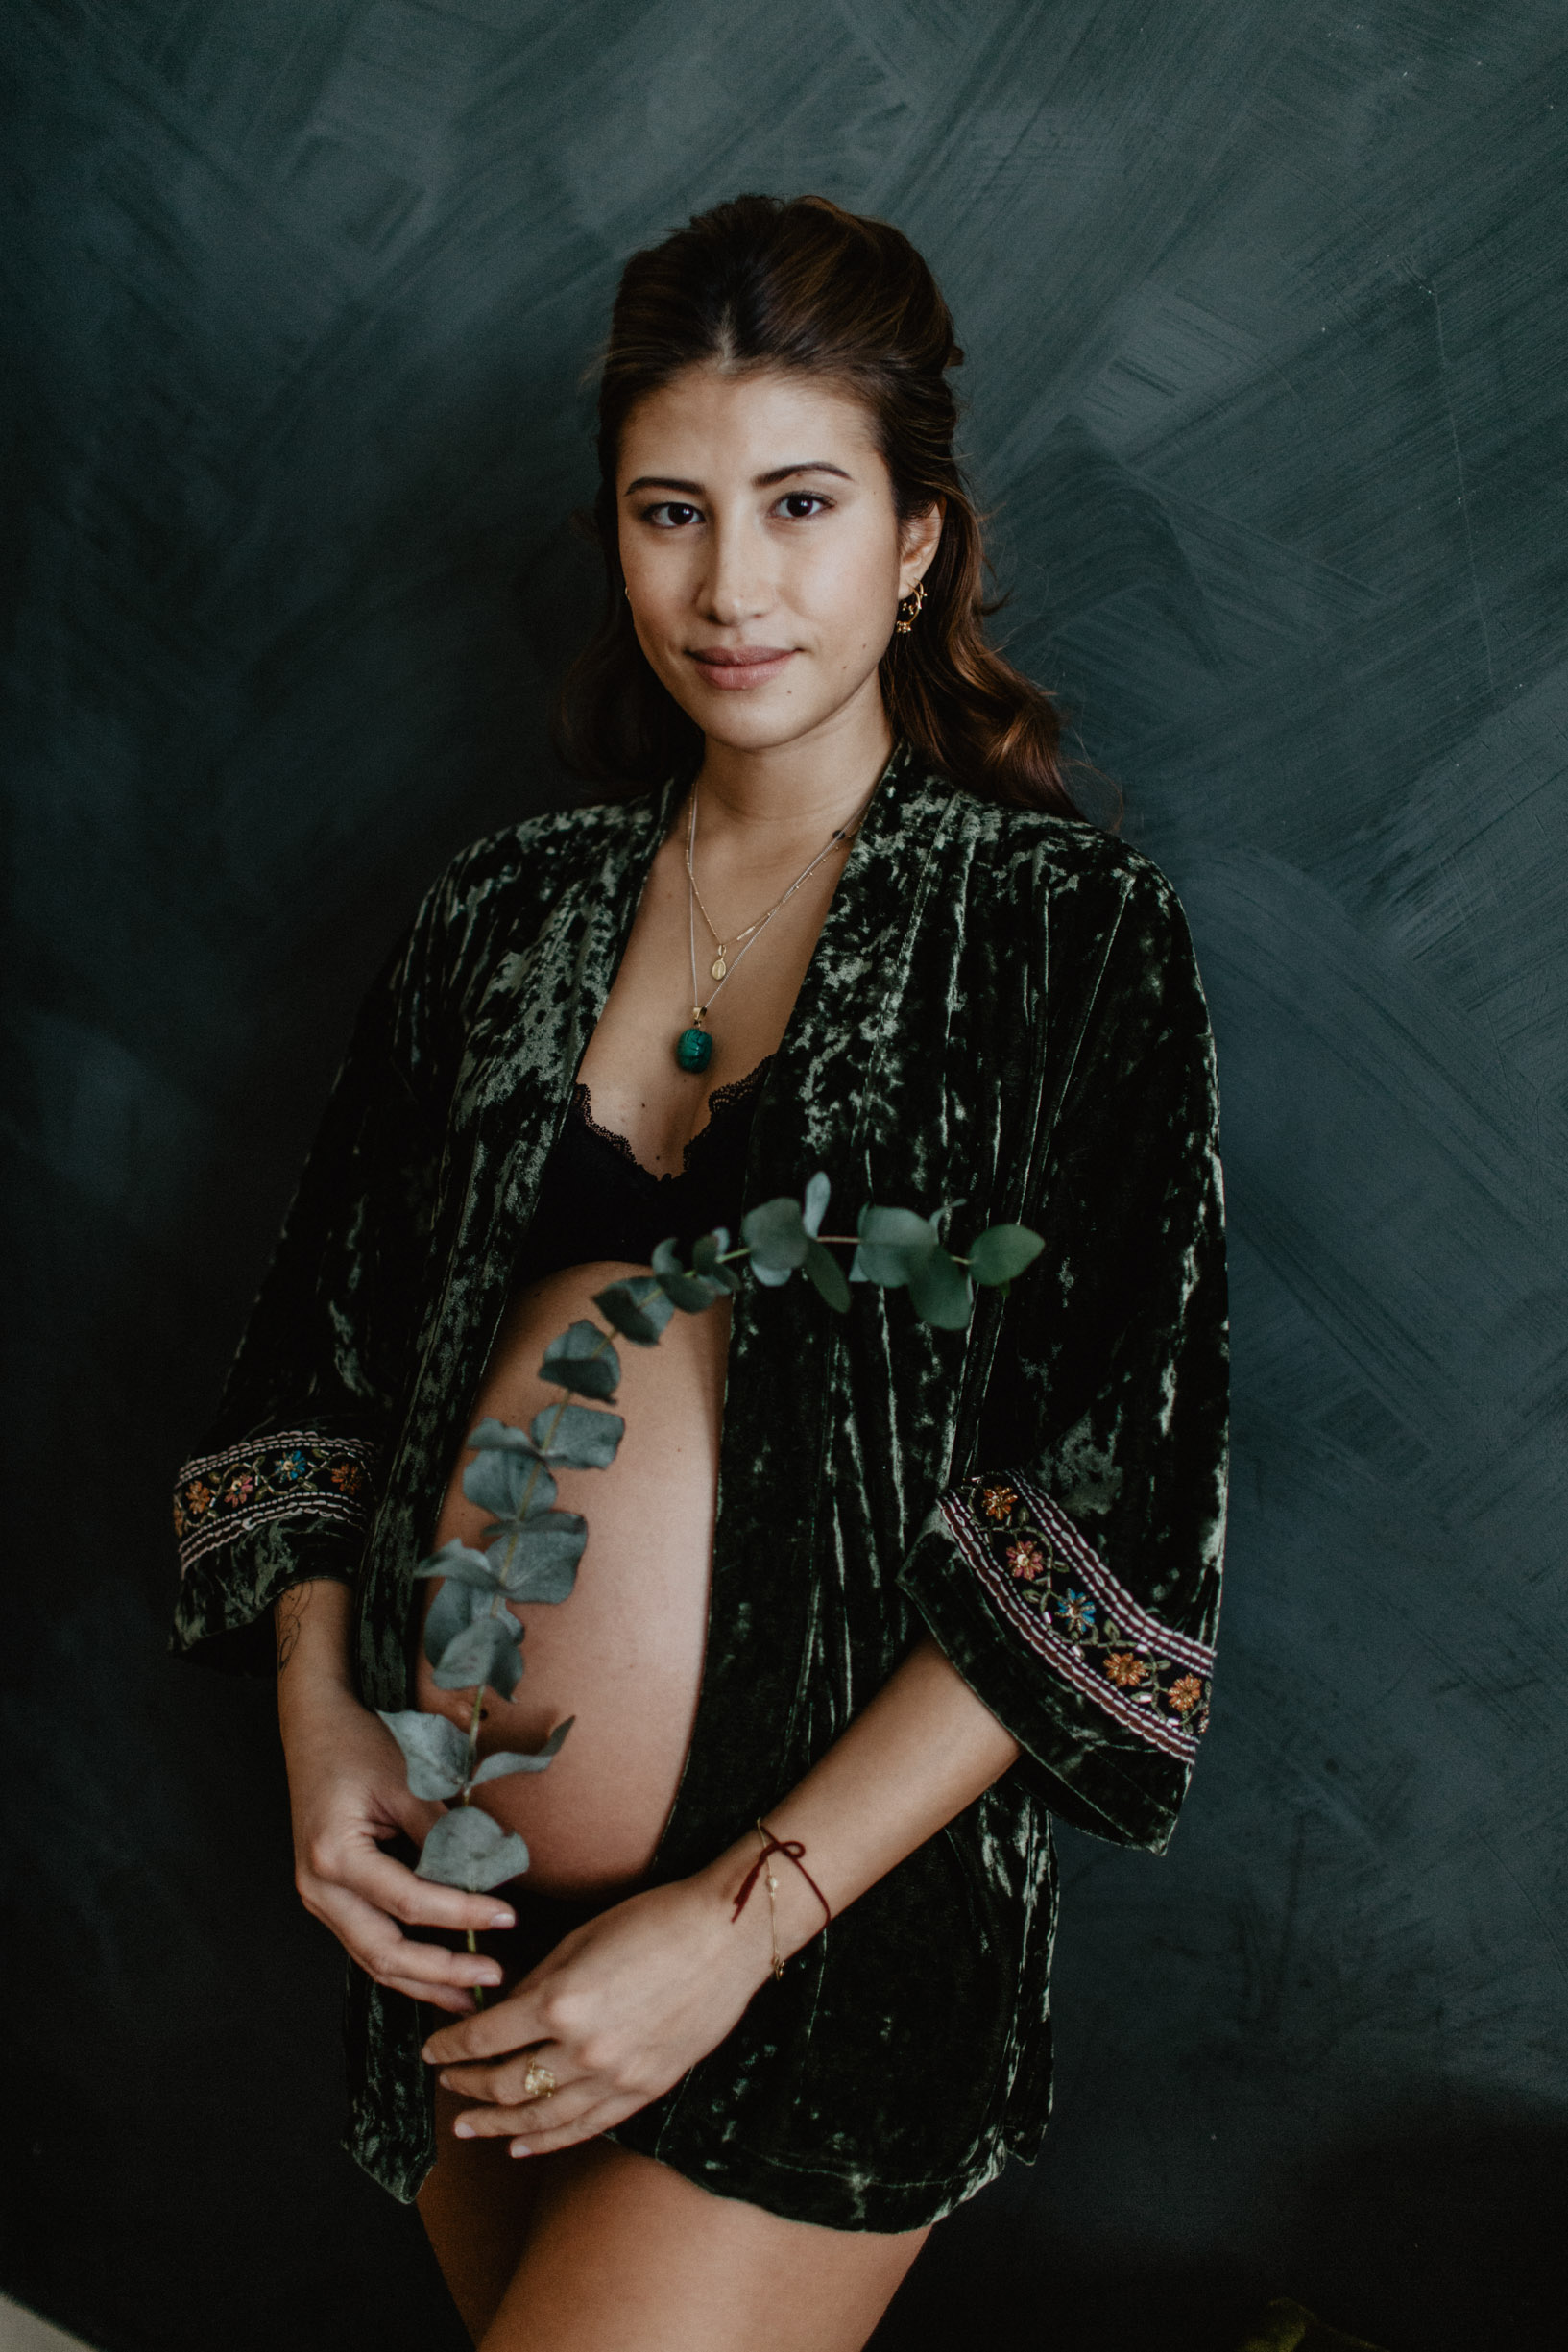 Pregnancy photoshoot in Amsterdam